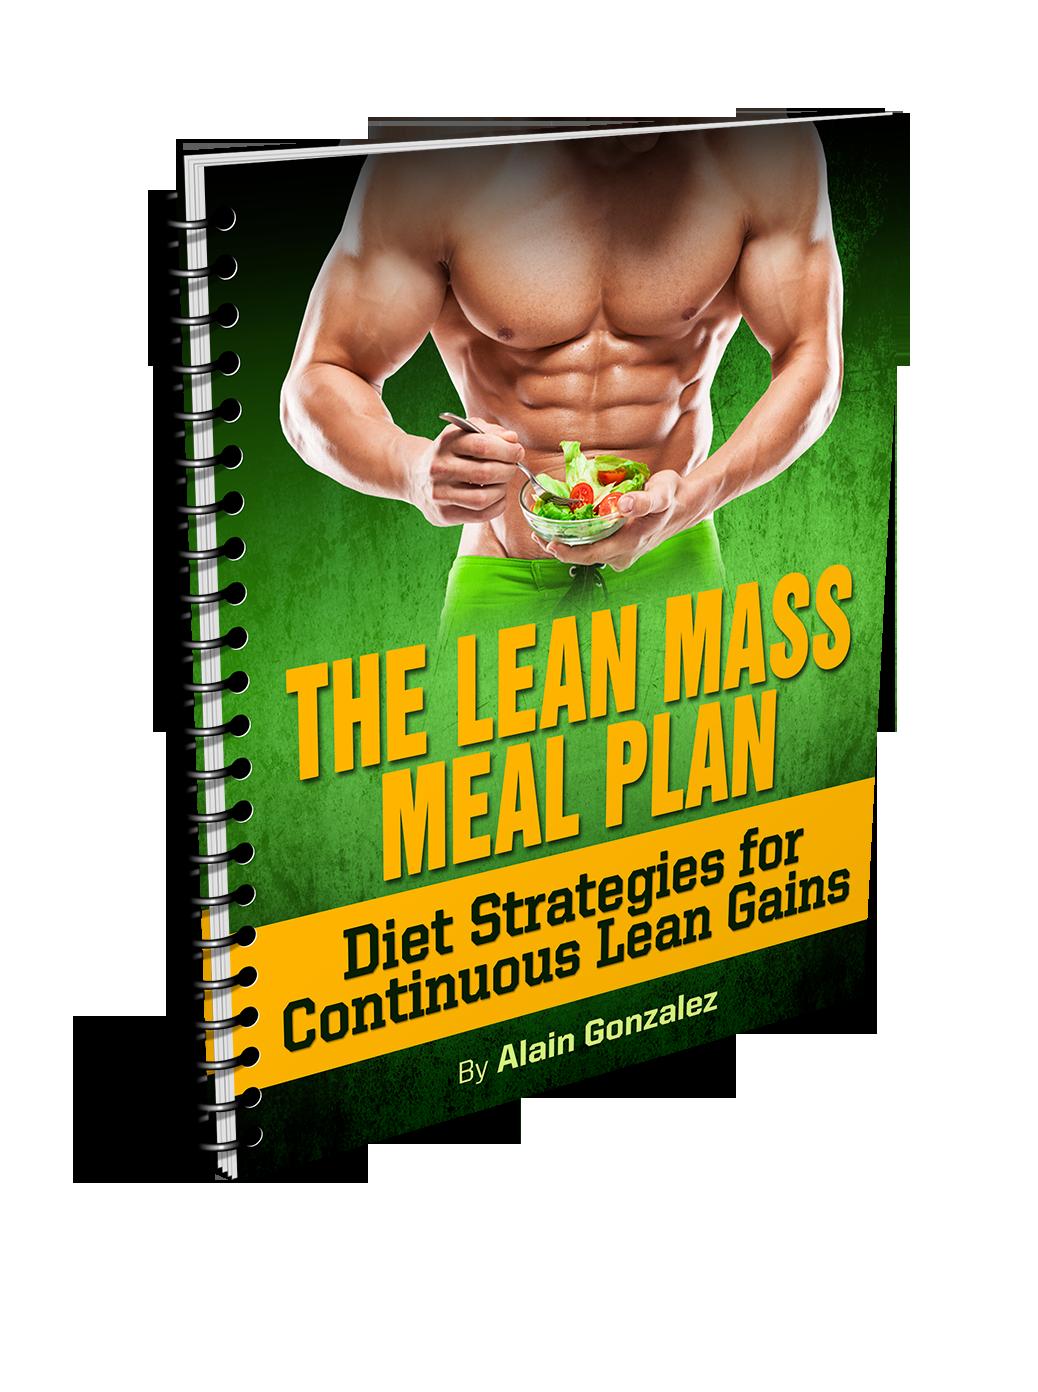 Lean Mass Meal Plan